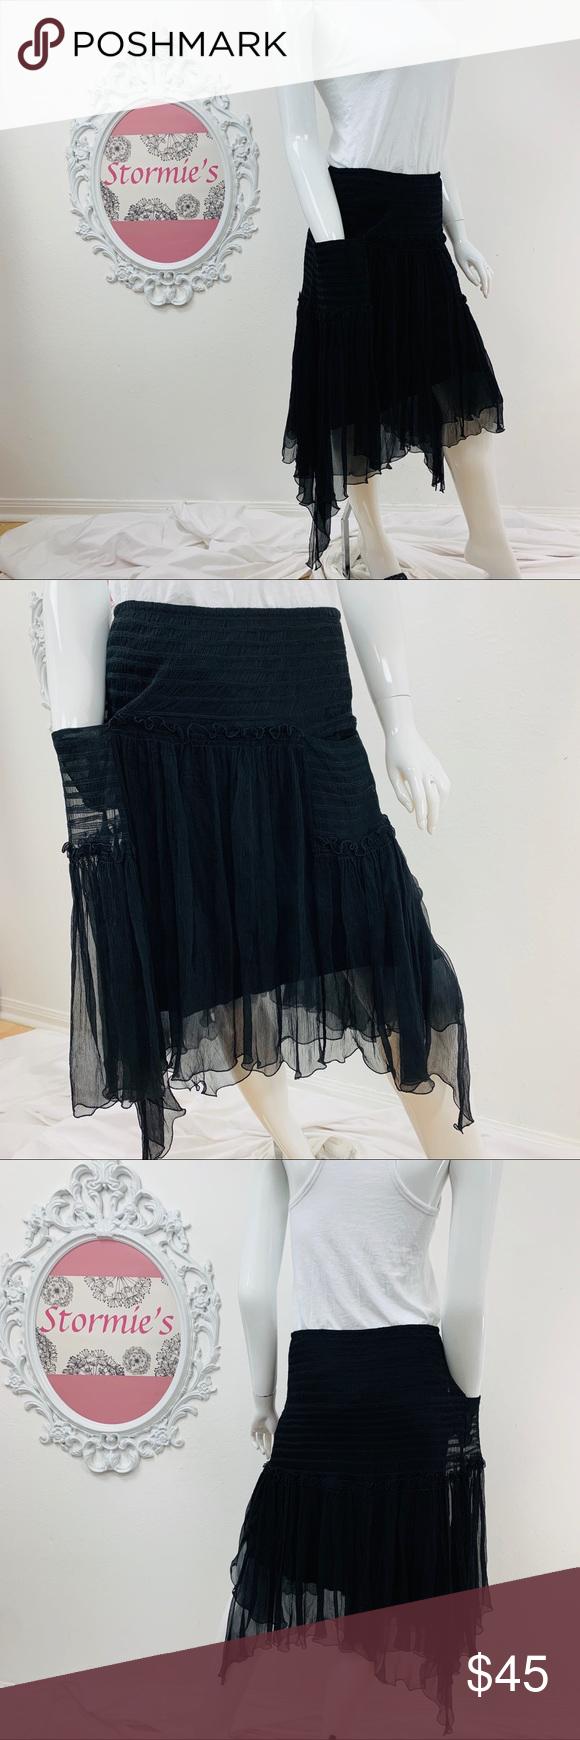 Max Studio Special / Asymmetric Black Silk Skirt Asymmetric Black Skirt. Fully Lined with ruffles. Front Pockets. Left side Zip. Layered ruffle detail. 100% SILK  Waist 14.5 Liner Length 24.5in. Skirt Length 26in.            ➡️Bundle to Save!!! #054 Max Studio Skirts Asymmetrical